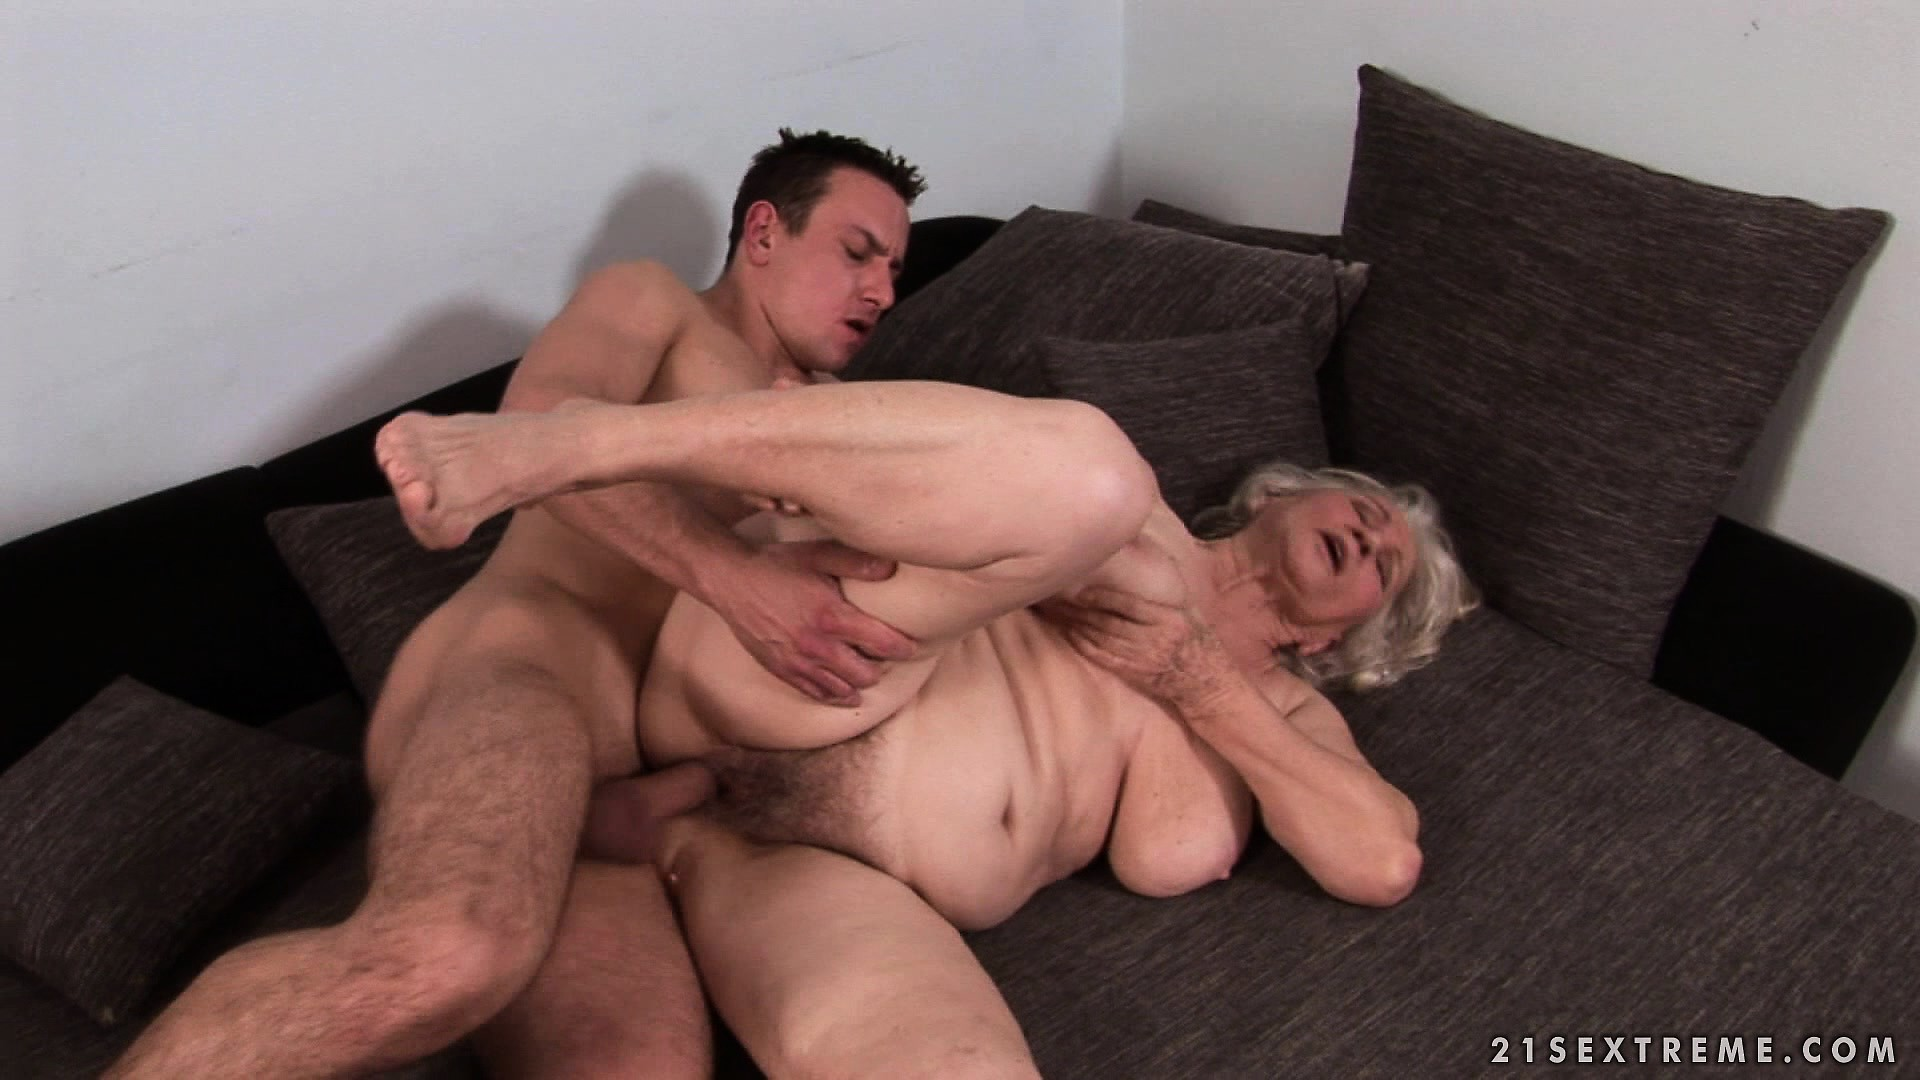 Big Tit Granny Porn - Free Mobile Porn & Sex Videos & Sex Movies - Big Saggy Tit ...